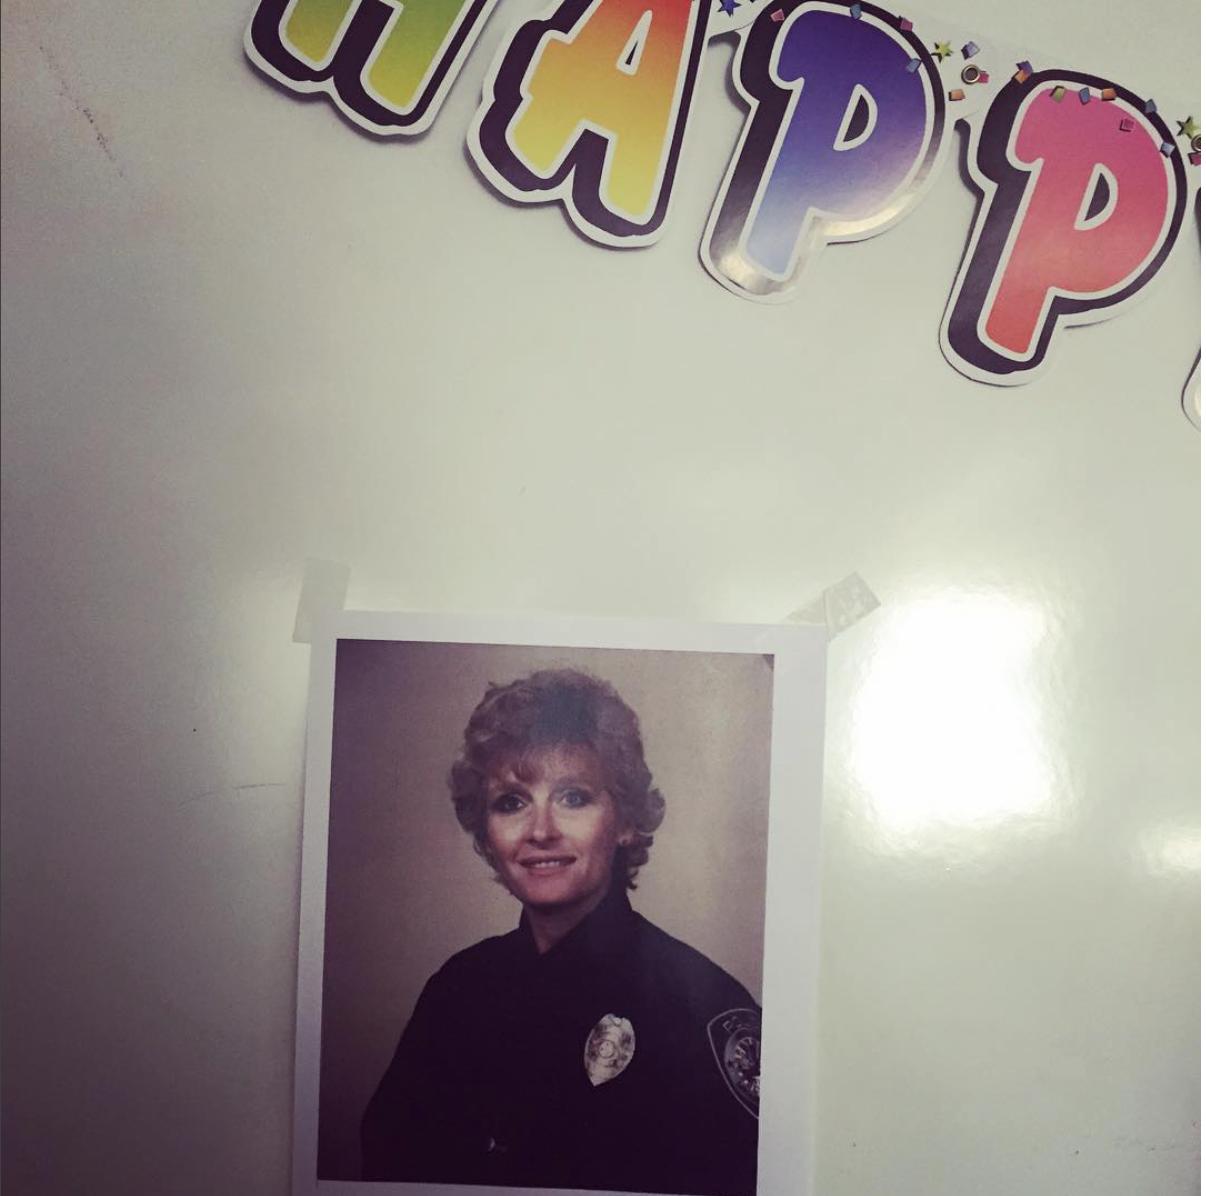 Lt BJ Land, Midland Police Department's  #first  #female  #Lieutenant , retirement party.  #MPD  #midlandpolicedepartment  #texas  #SnapshotLives